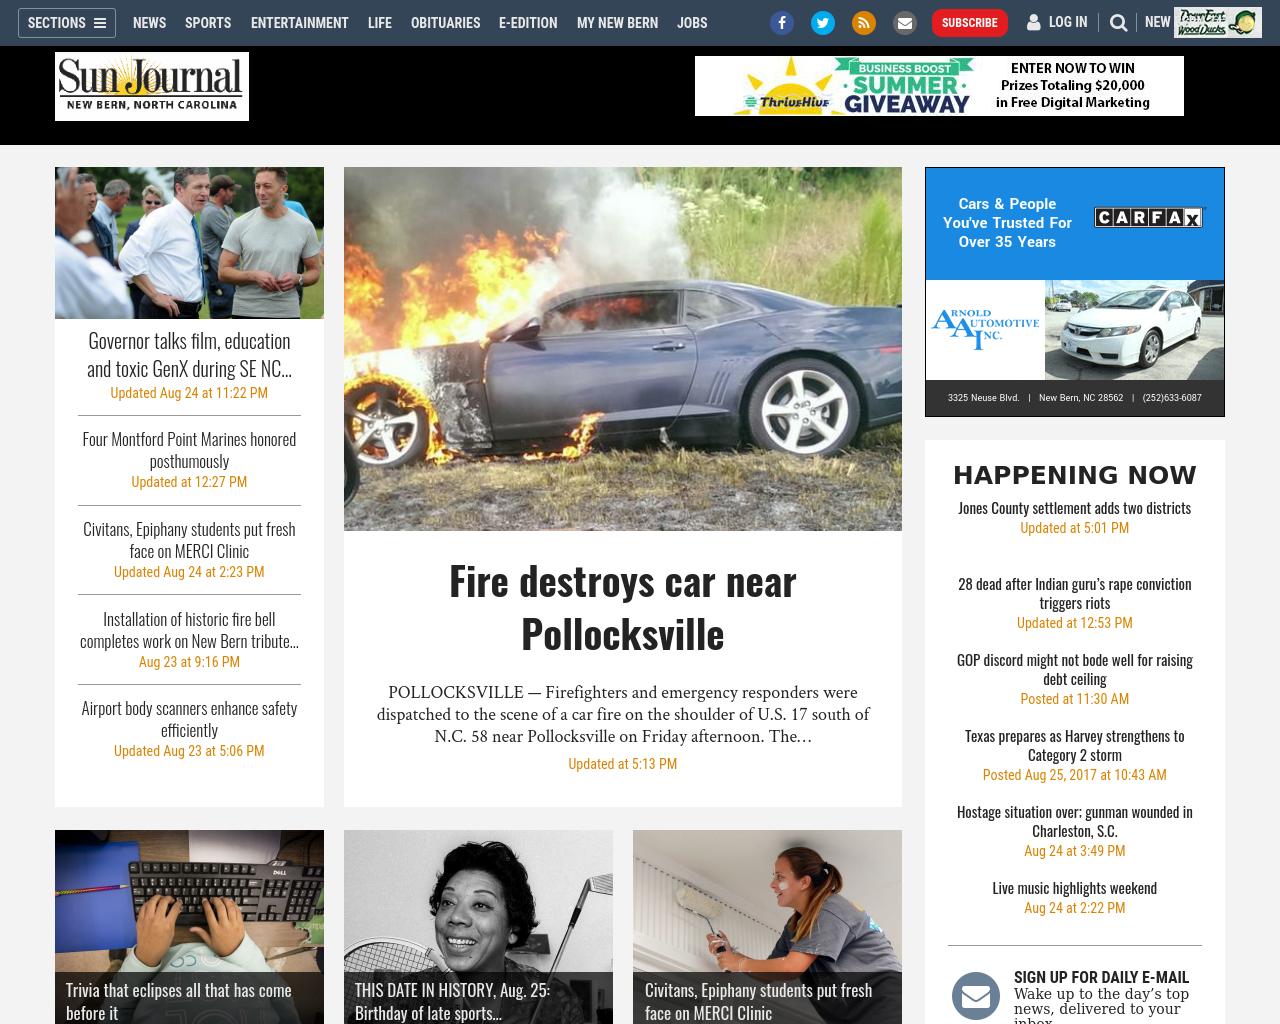 Sun-Journal-New-Bern,-North-Carolina-Advertising-Reviews-Pricing